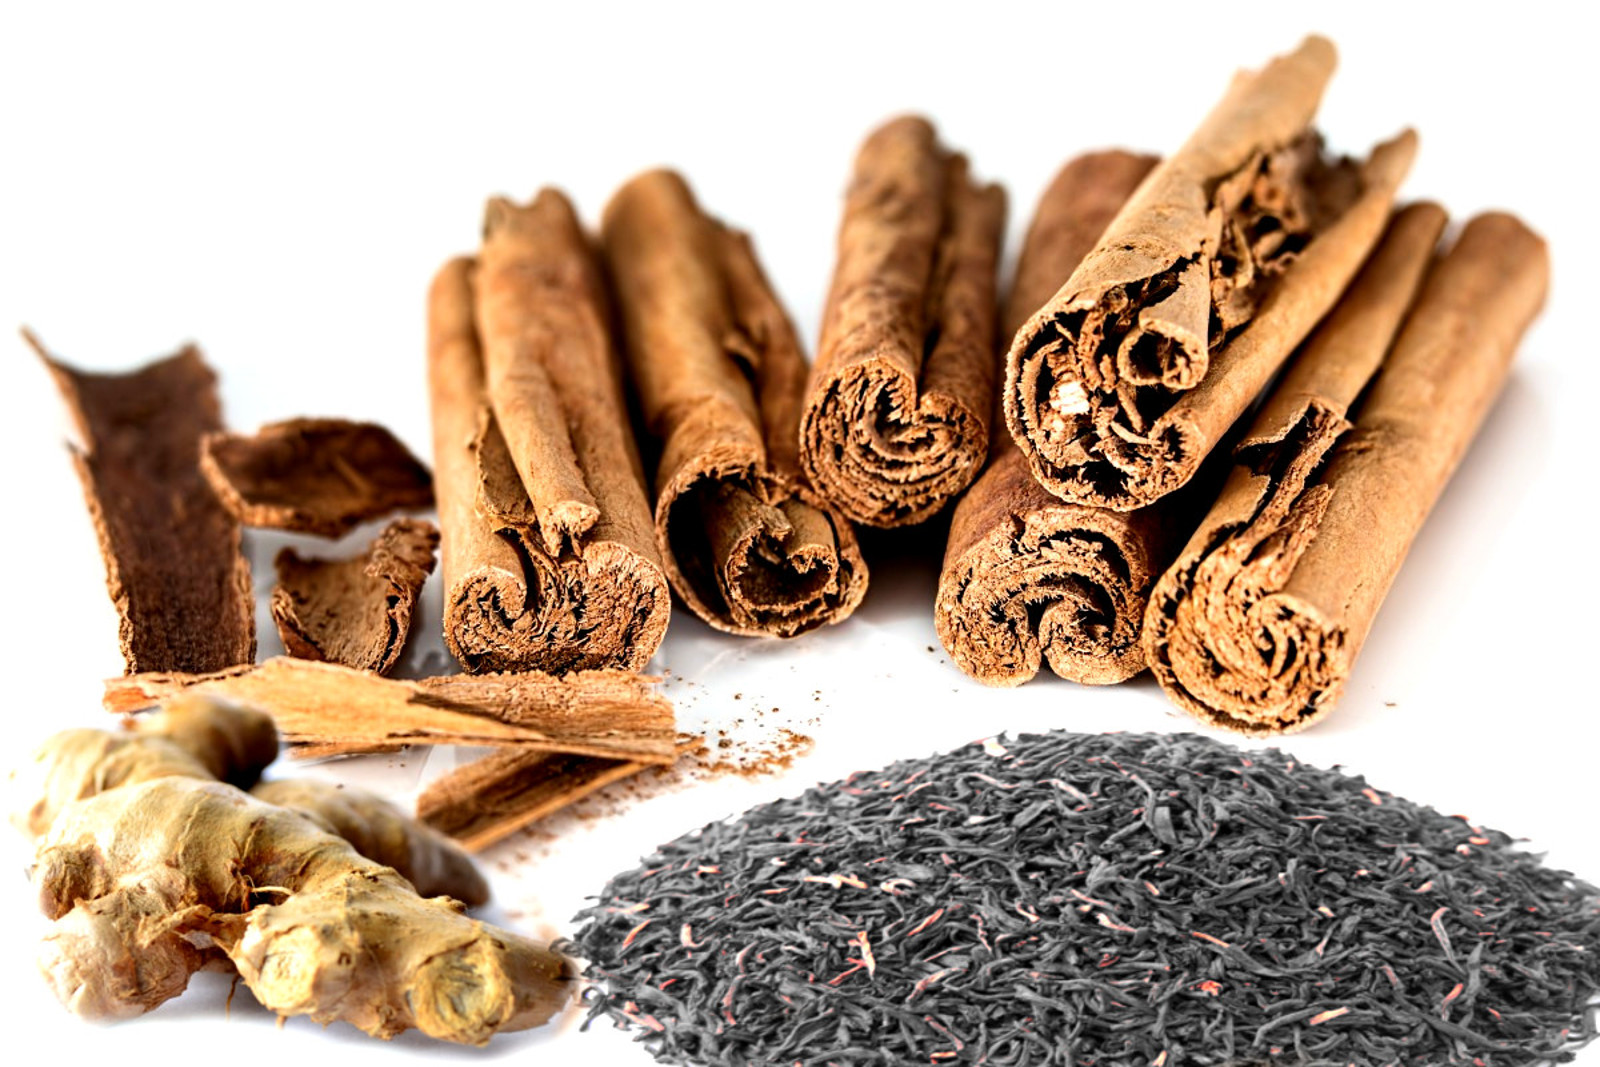 Cinnamon, ginger and black tea